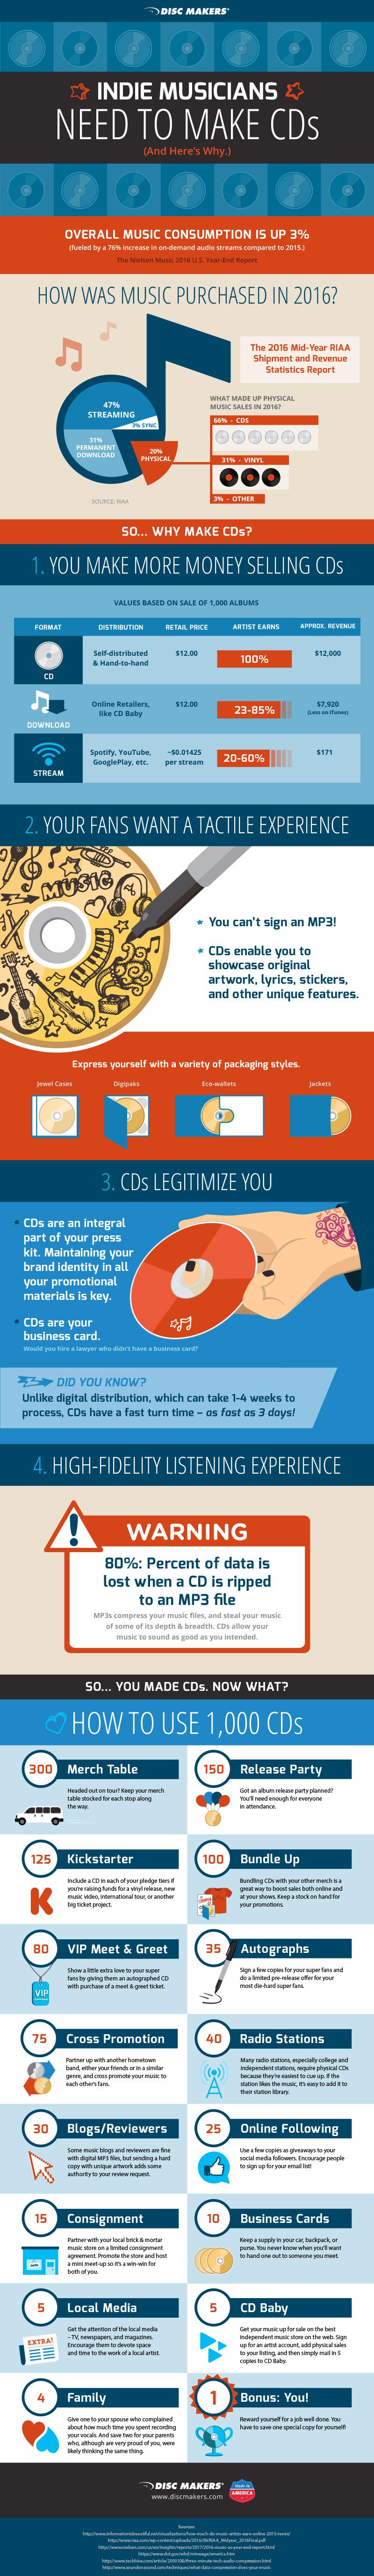 Why Indie Musicians Make CDs